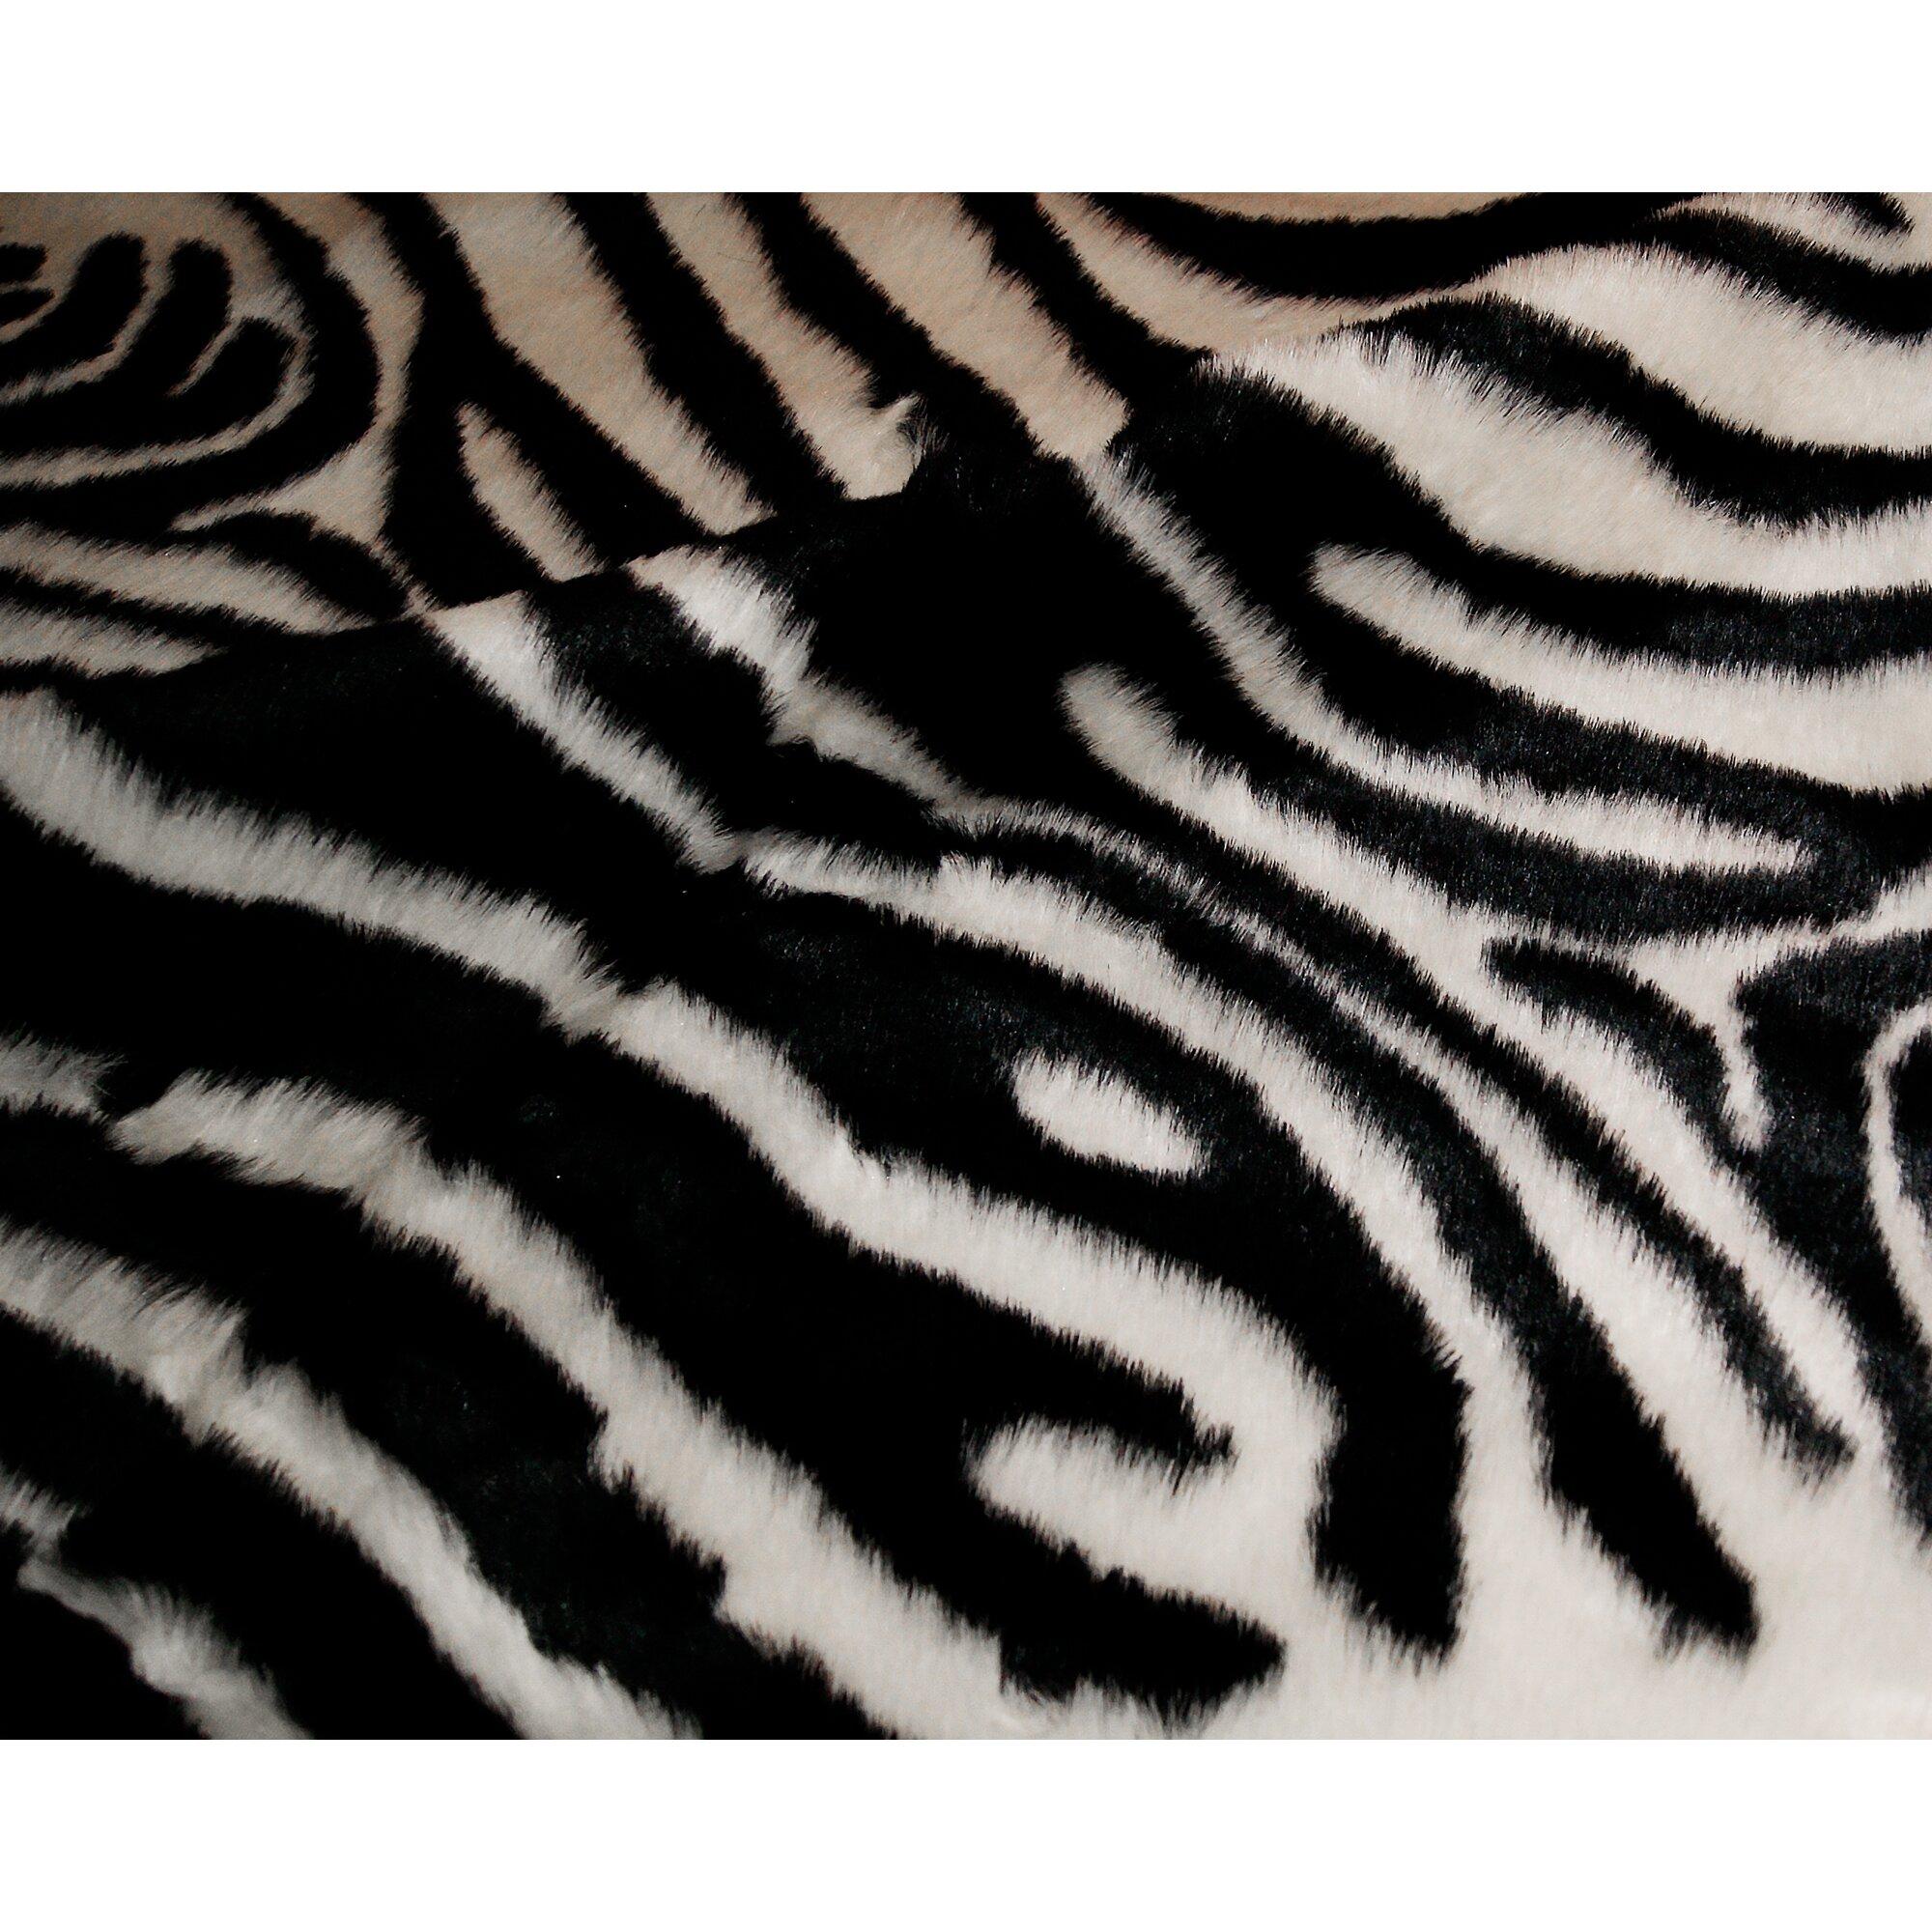 Luxe Zebra Black White Area Rug Reviews